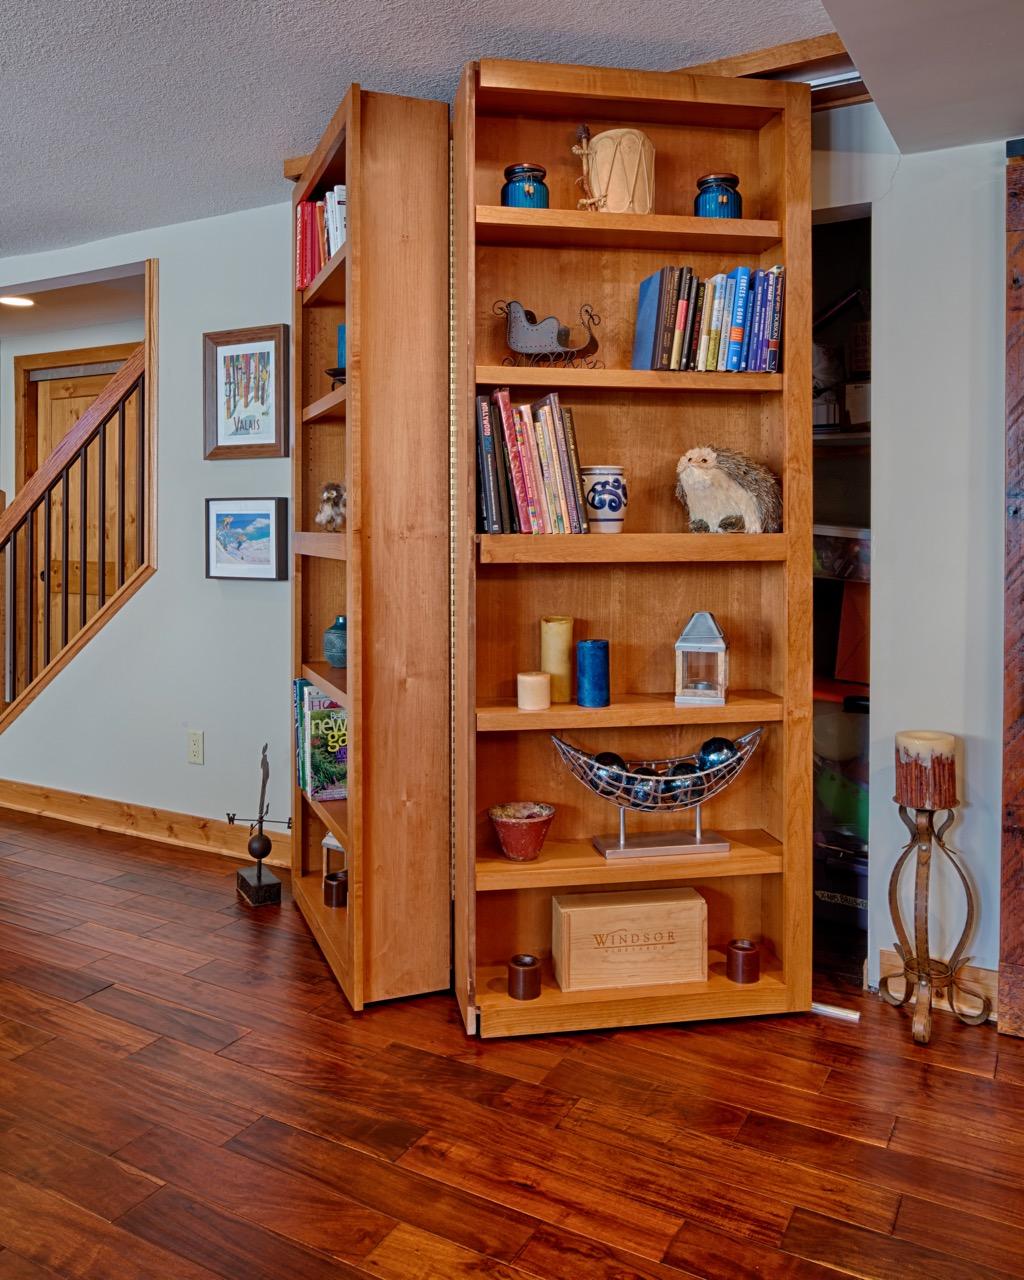 Mom's Design Build - Minnetonka Basement Remodel Hidden Storage